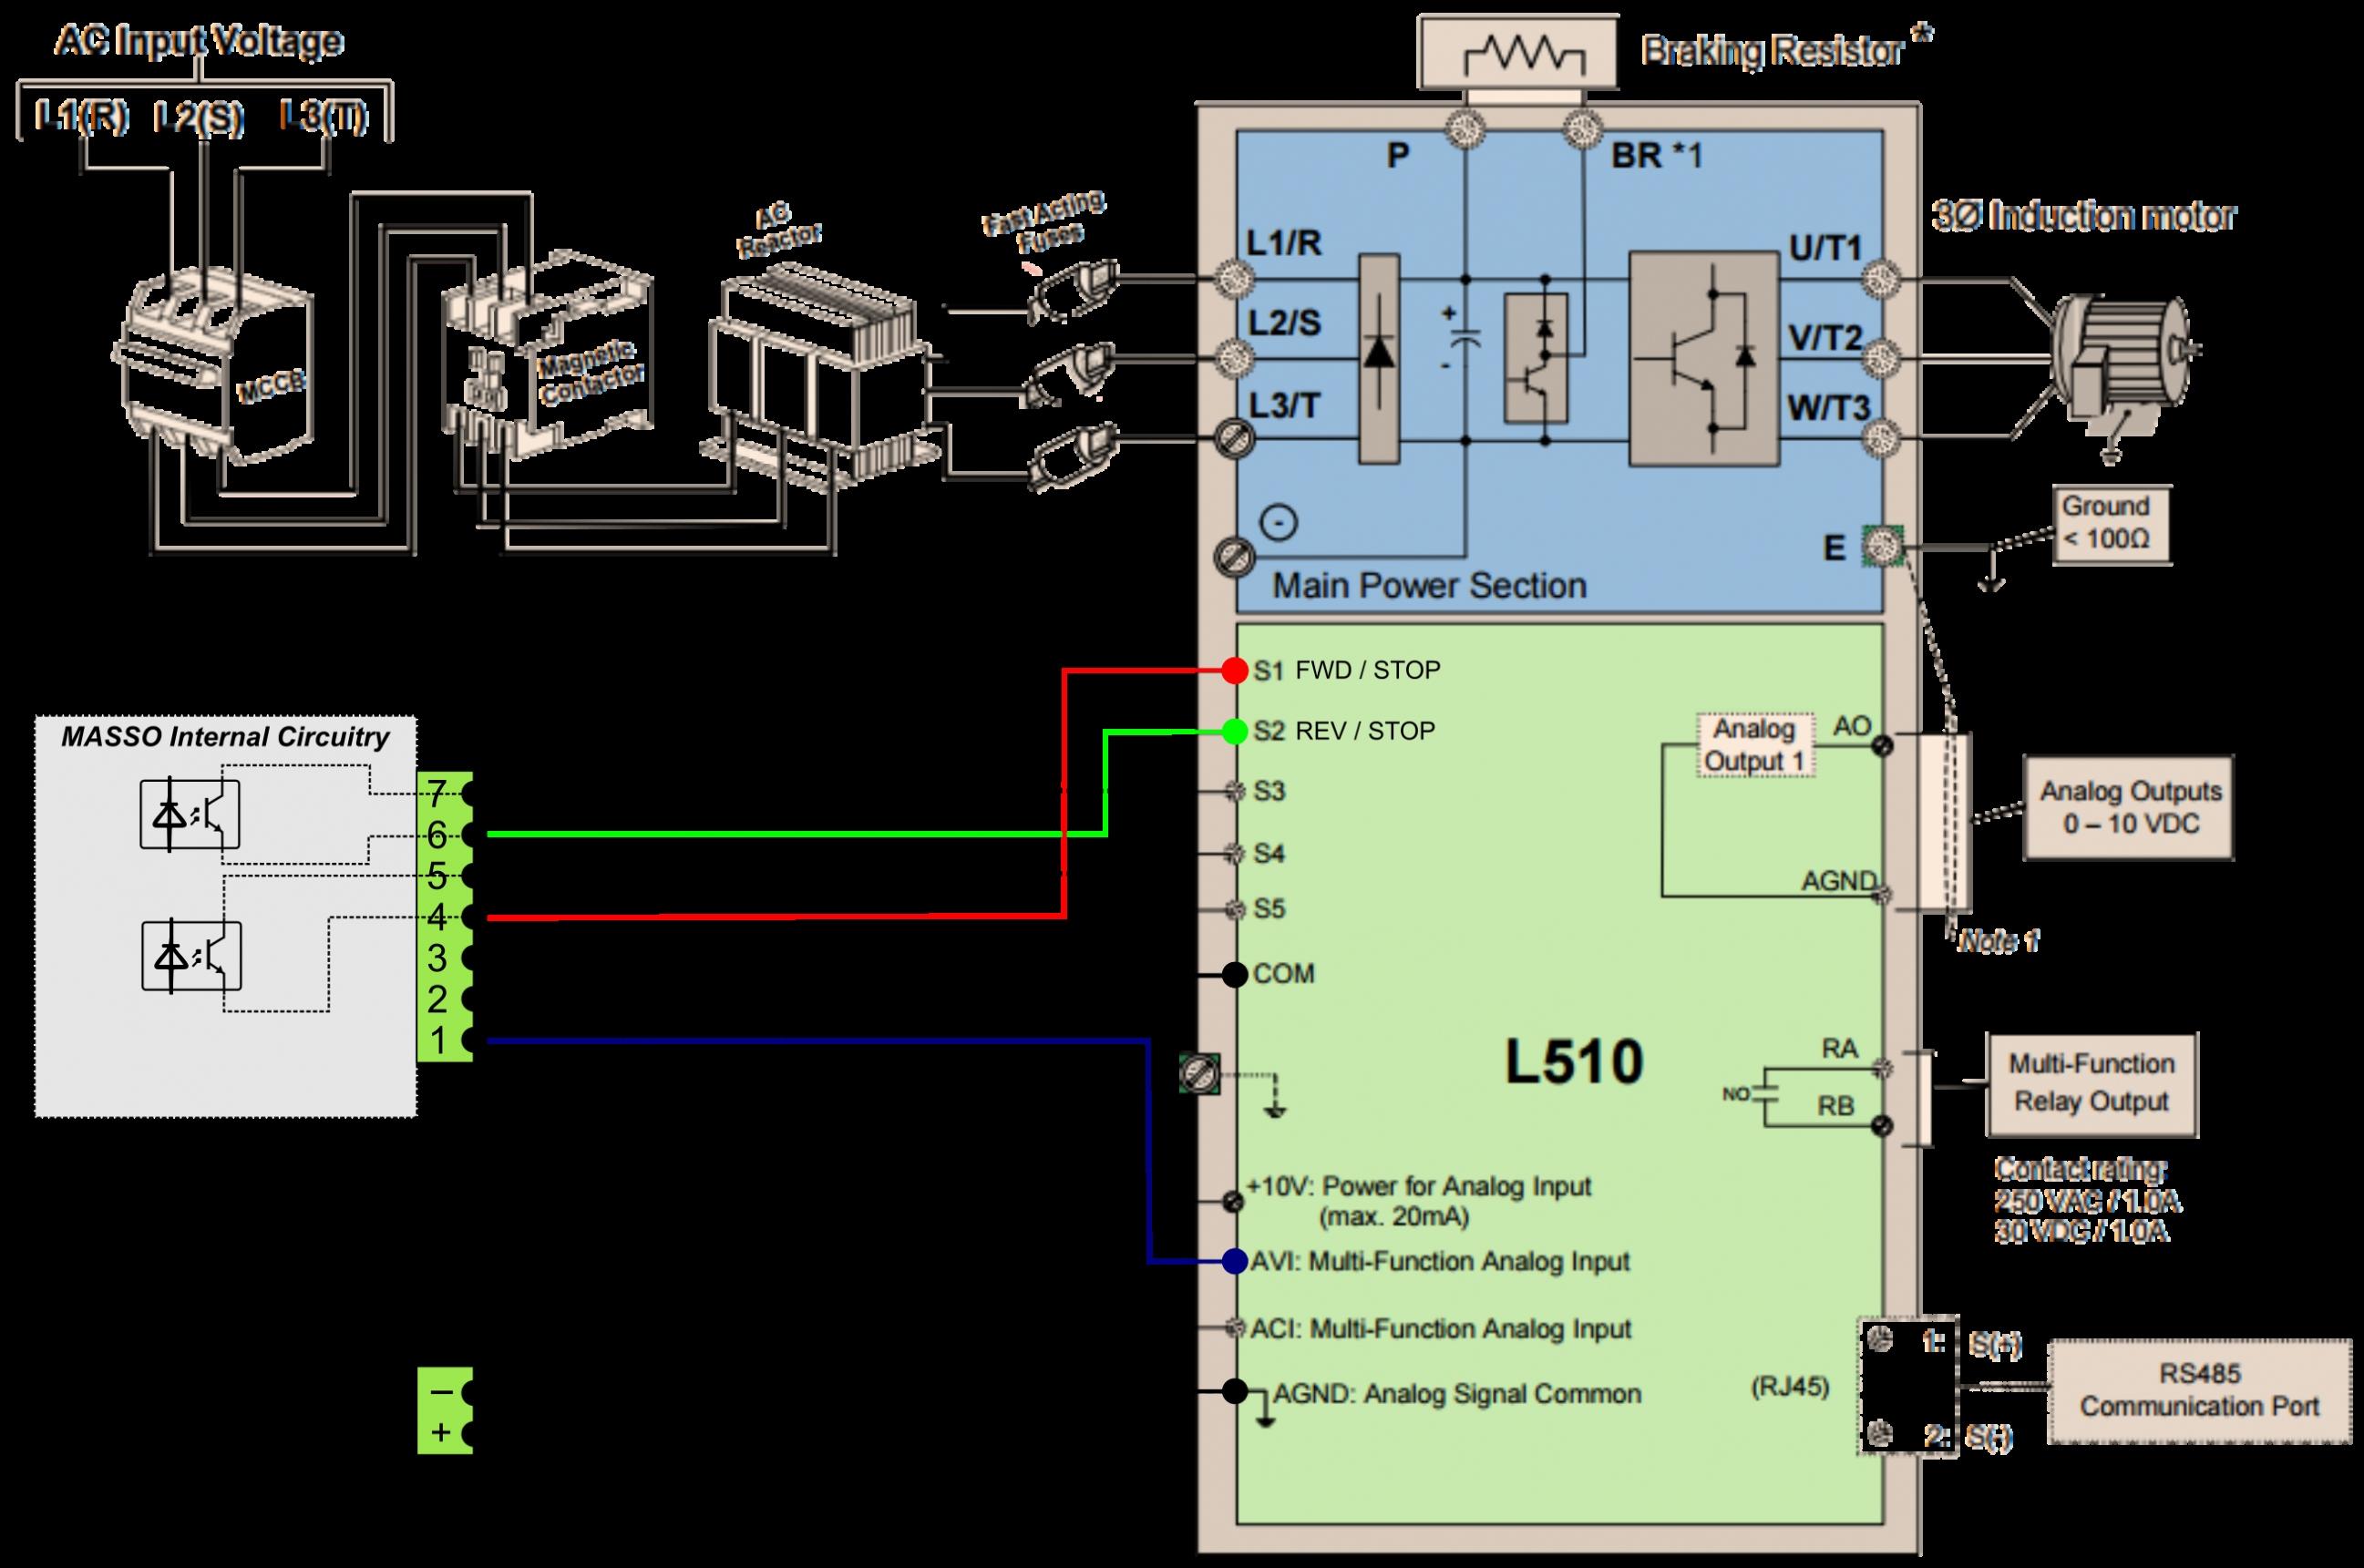 Electric Motor Wiring Diagram Single Phase – Dayton Electric Motors - Dayton Electric Motors Wiring Diagram